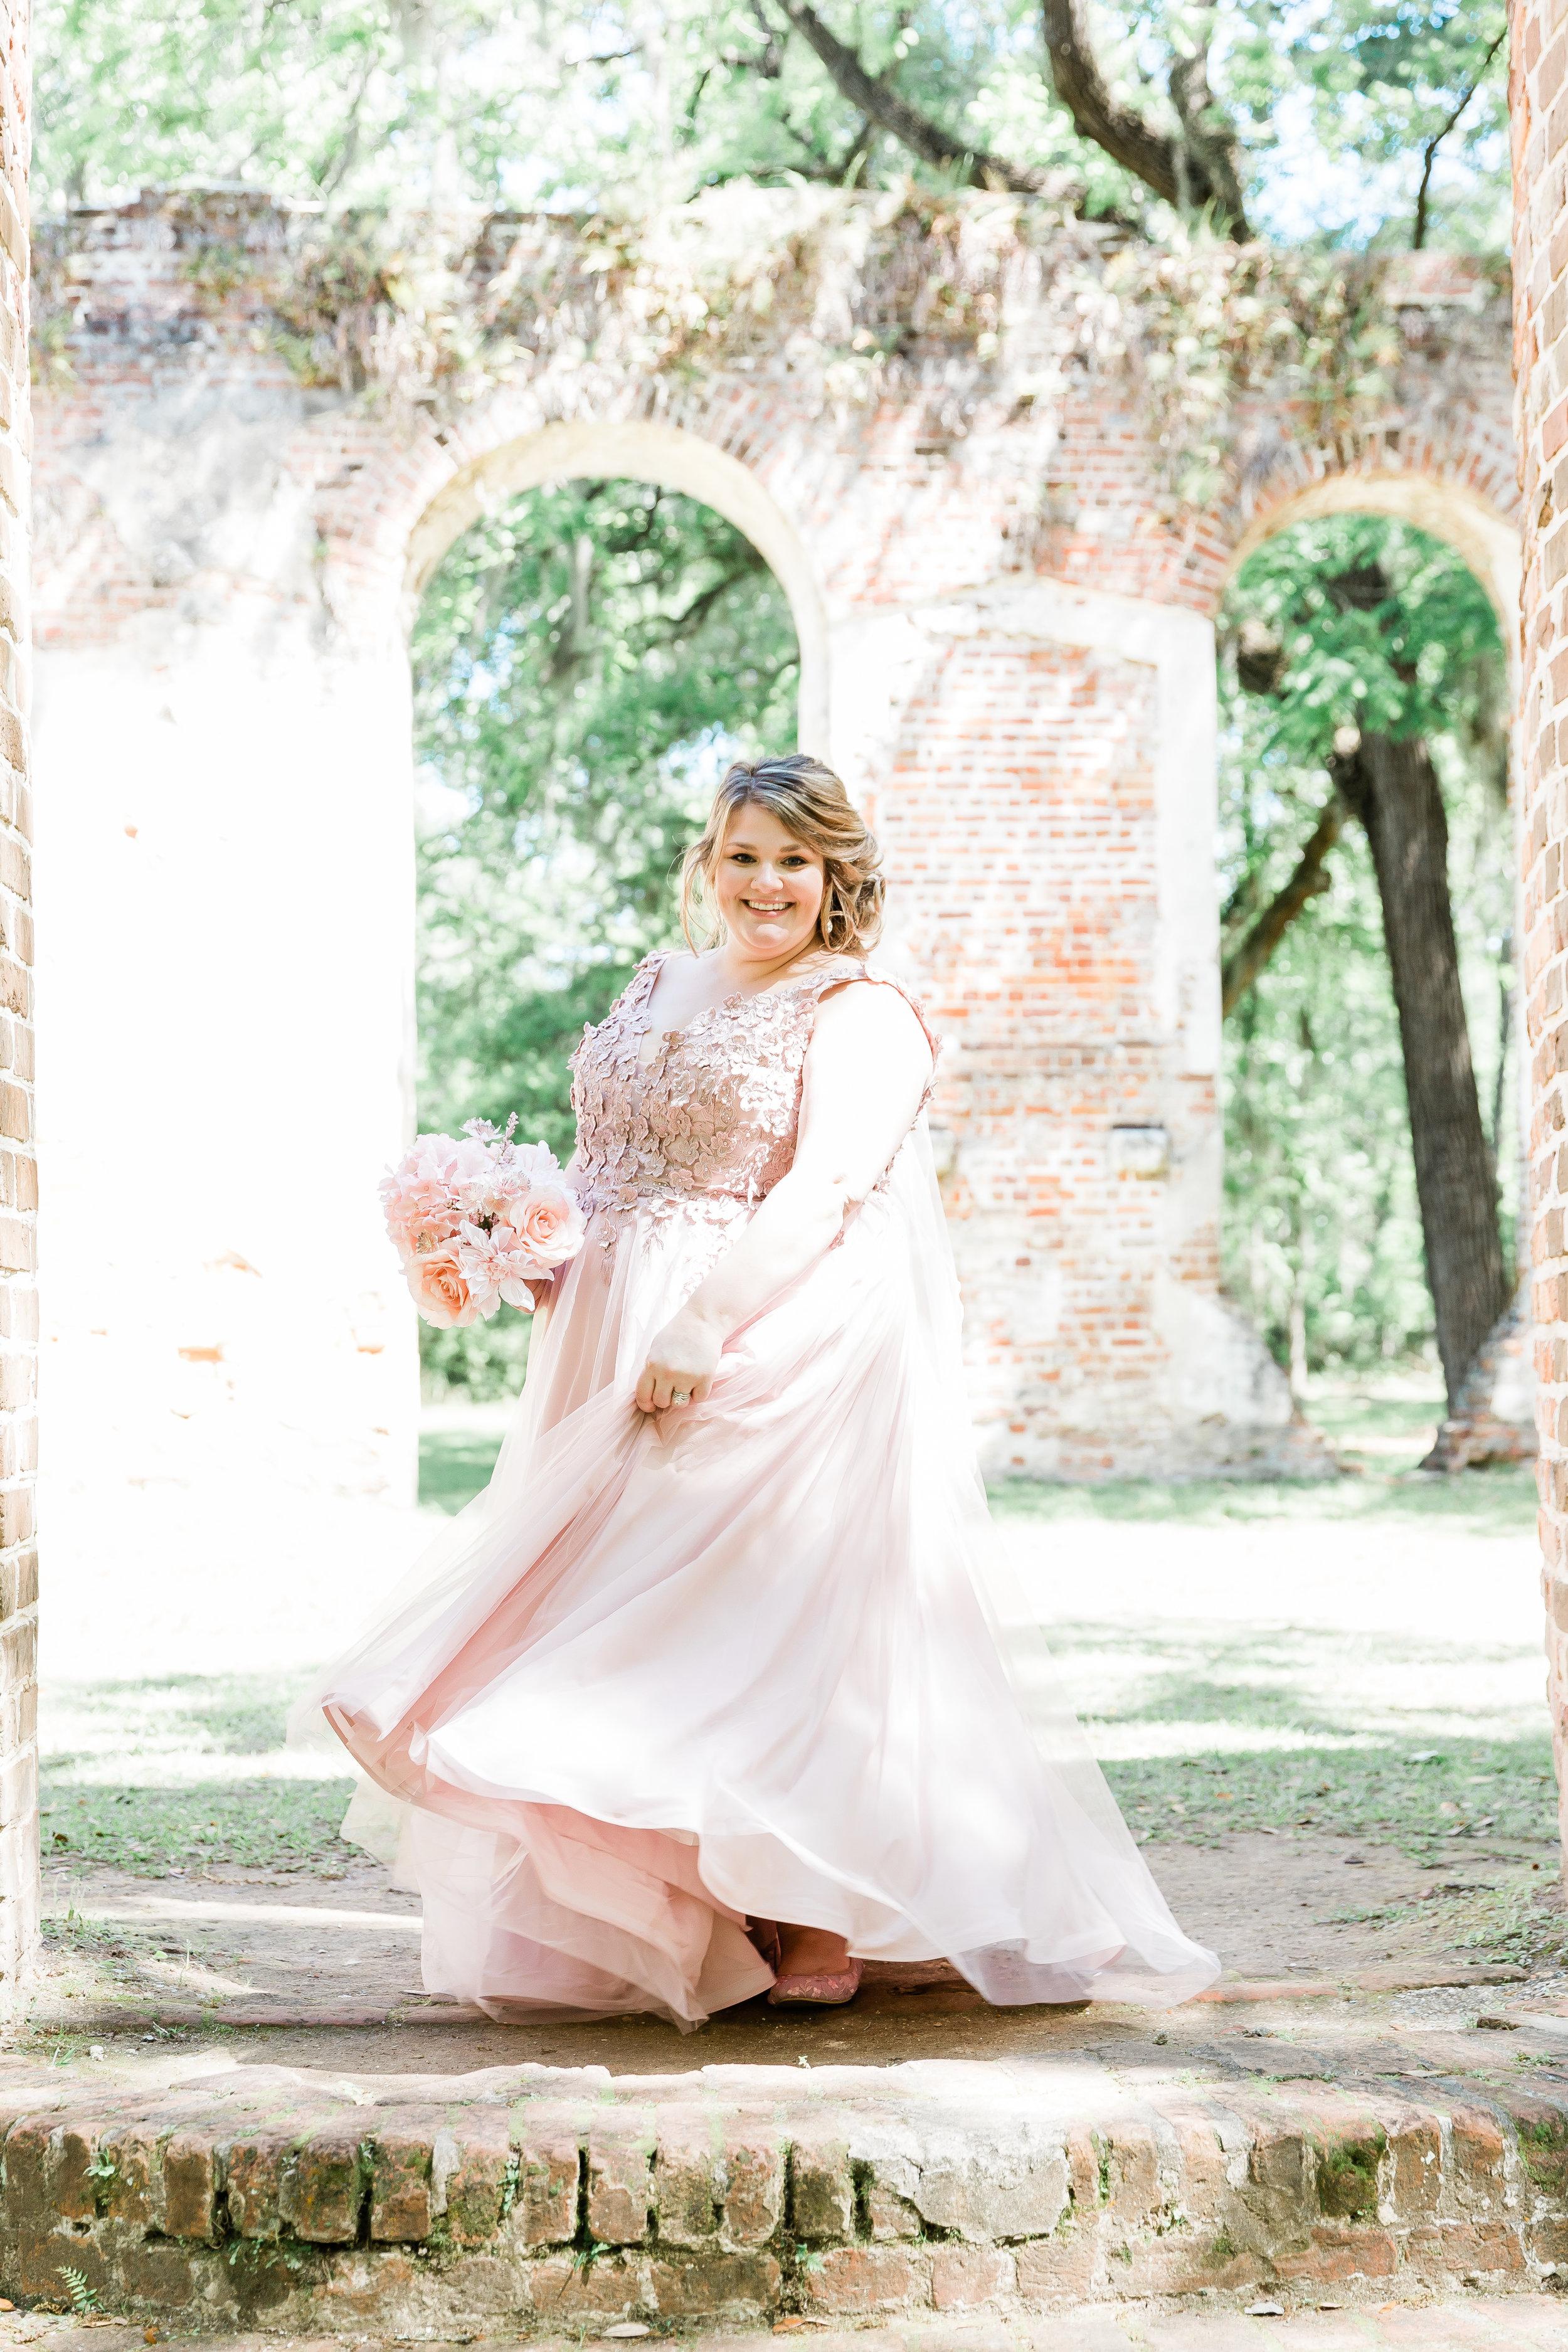 20190417-Southern Lens Photography-savannah family photographer- Ashley and Zack-old sheldon church ruins-201939.jpg